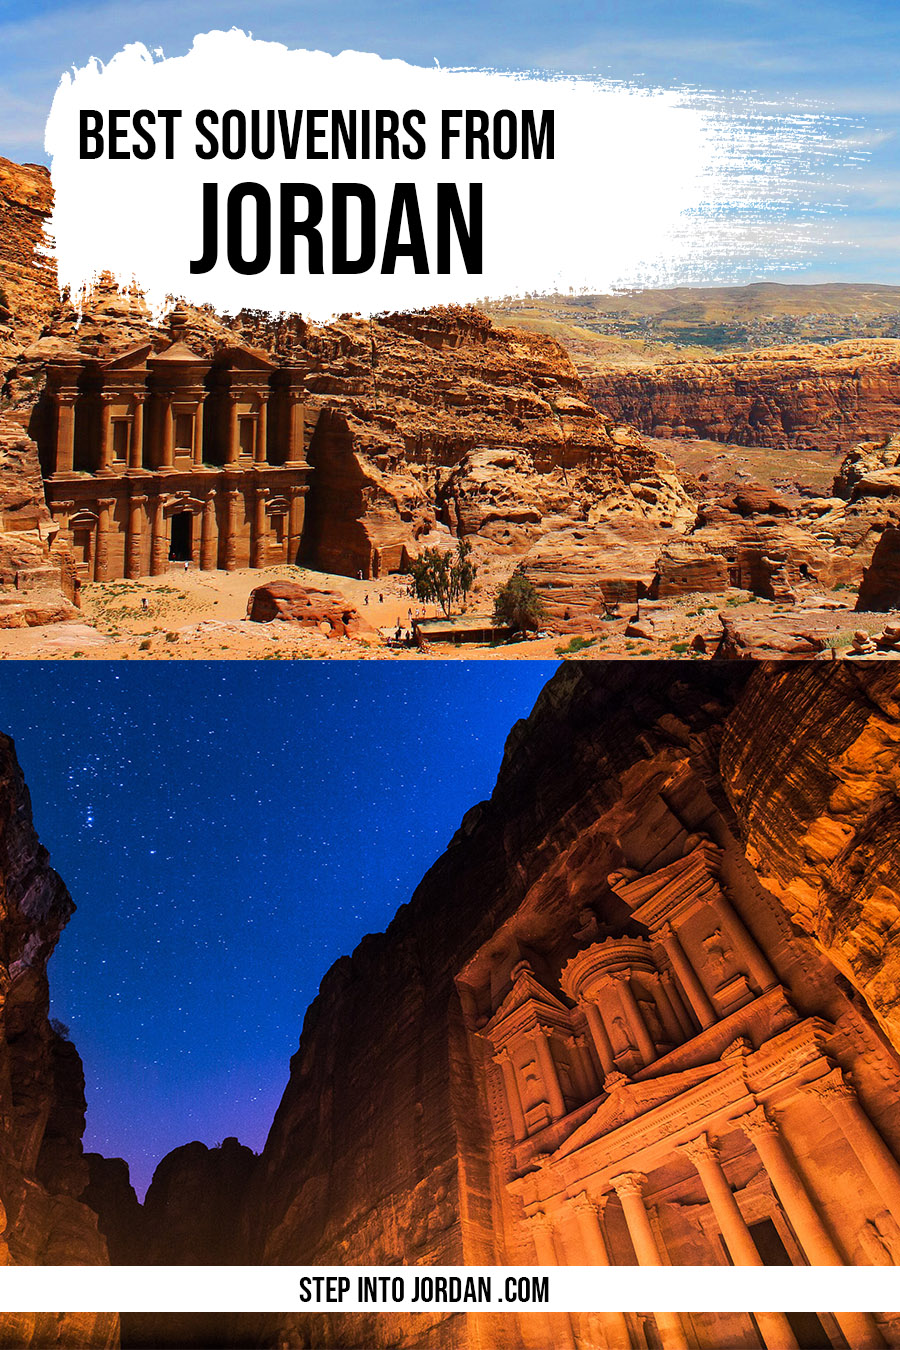 What to Buy in Jordan Souvenirs